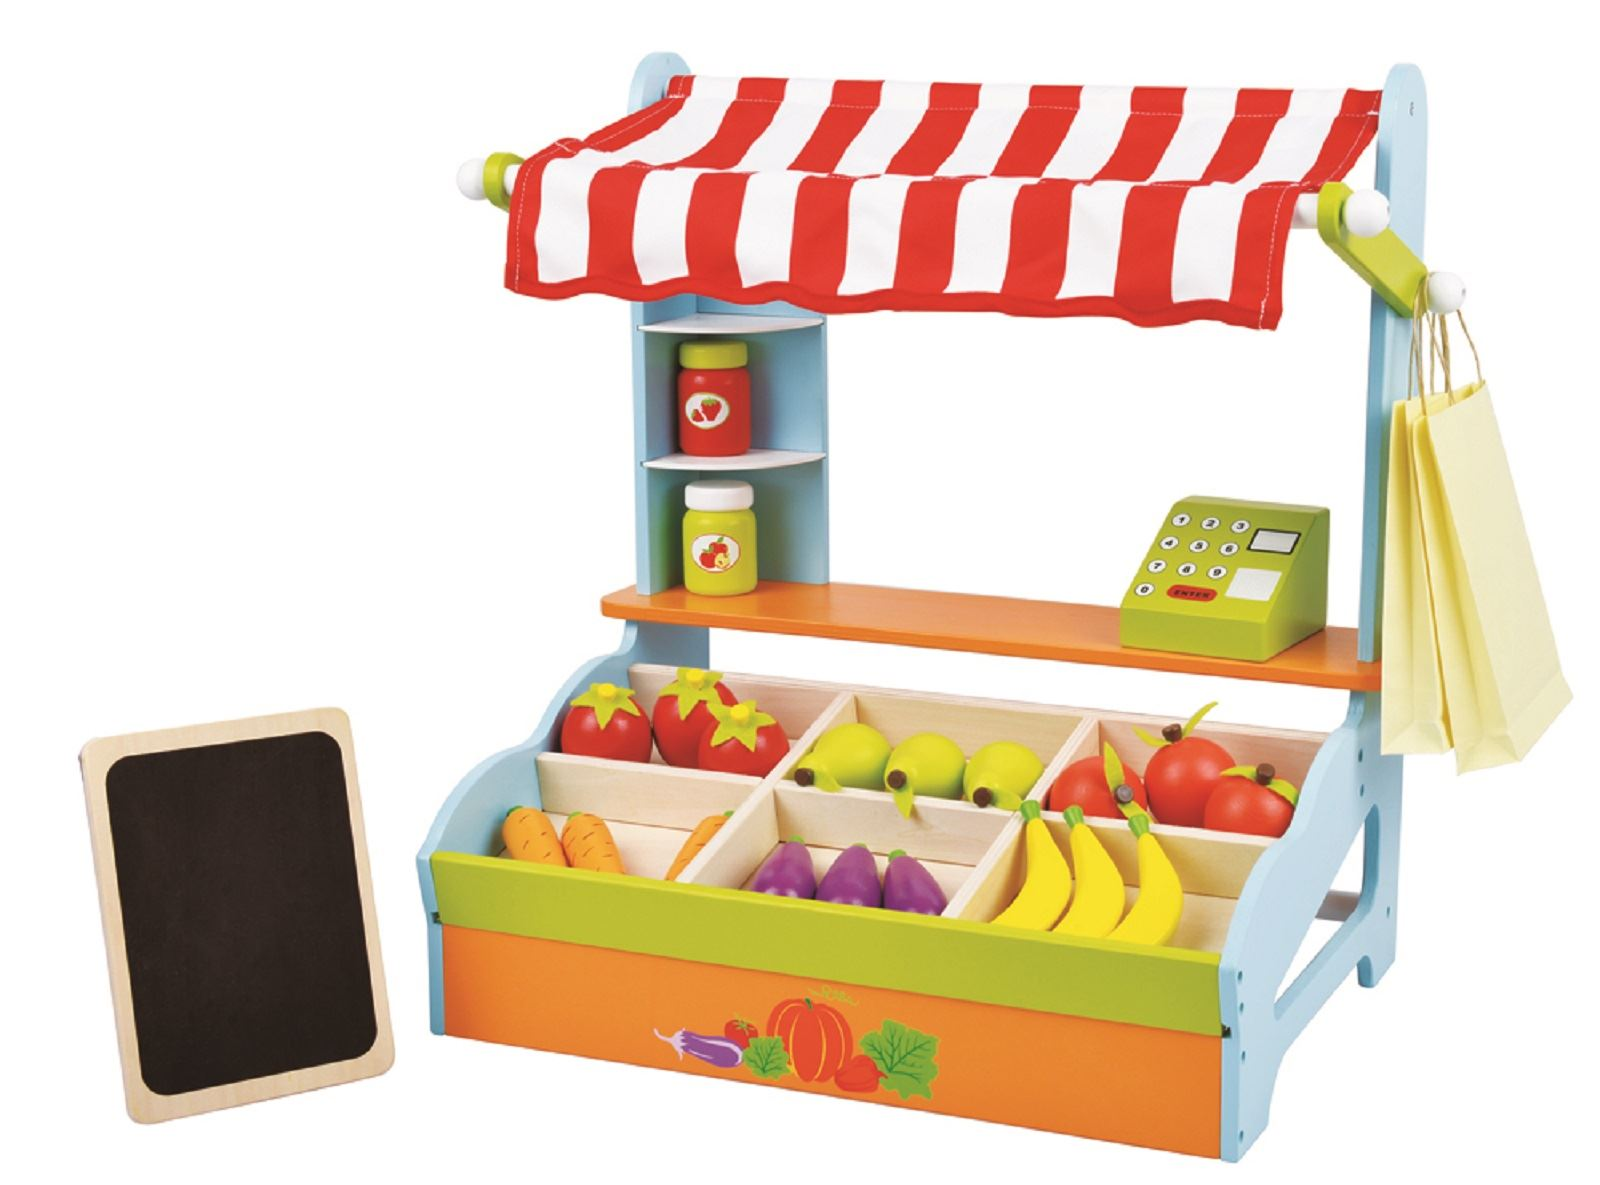 Lelin Wooden Childrens Mini Supermarket Shopping Grocery